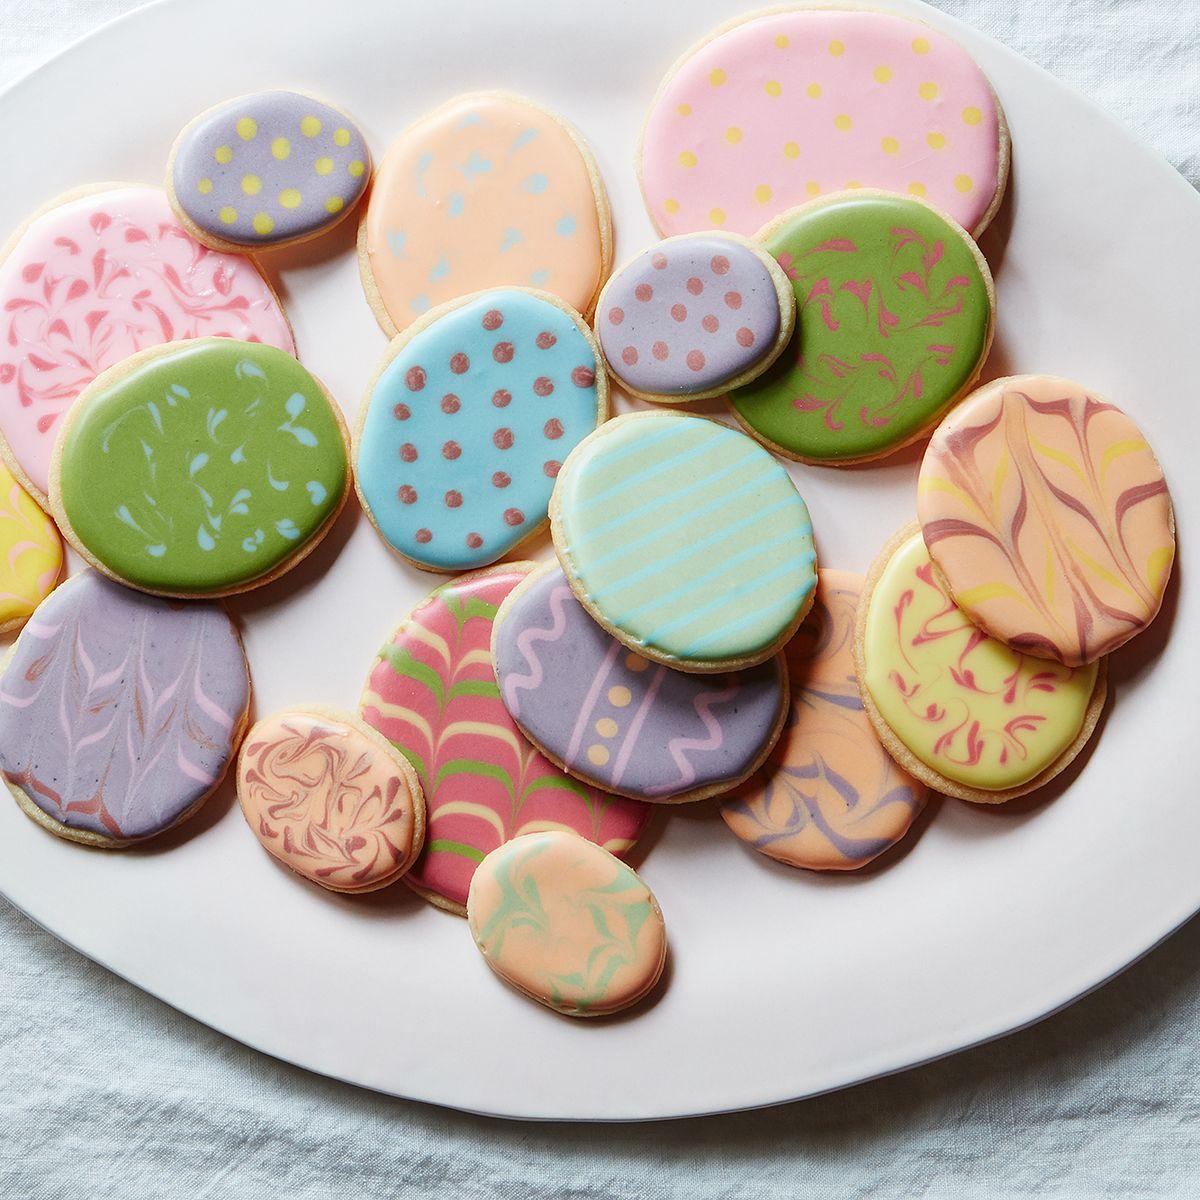 Royal Icing and Natural Food Colorings Recipe on Food52